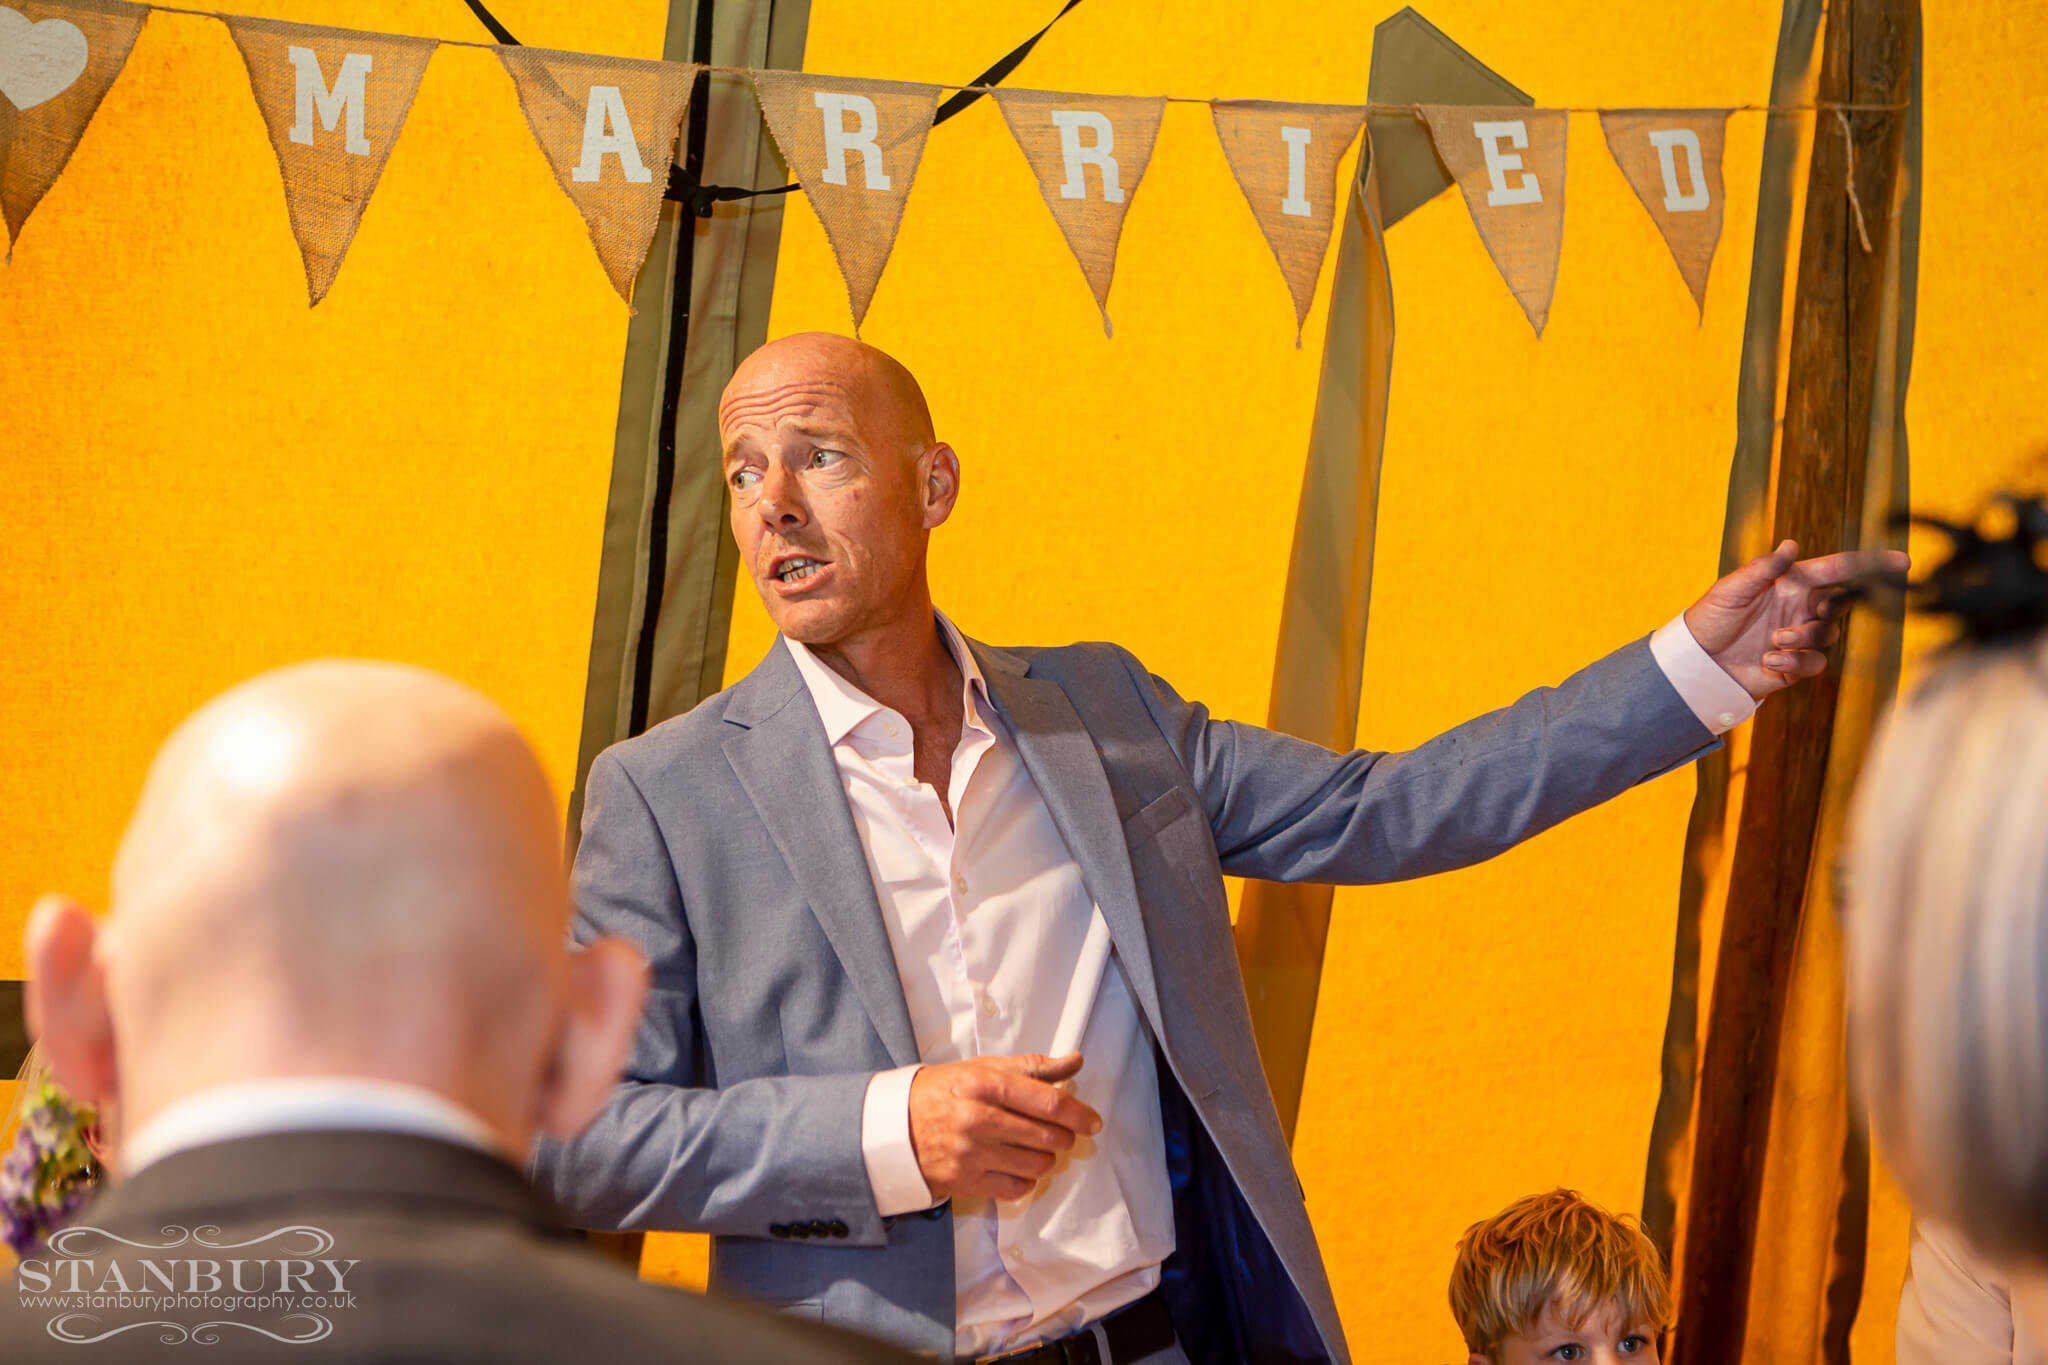 tipi-festival-wedding-speeches-photography-lancashire-stanbury